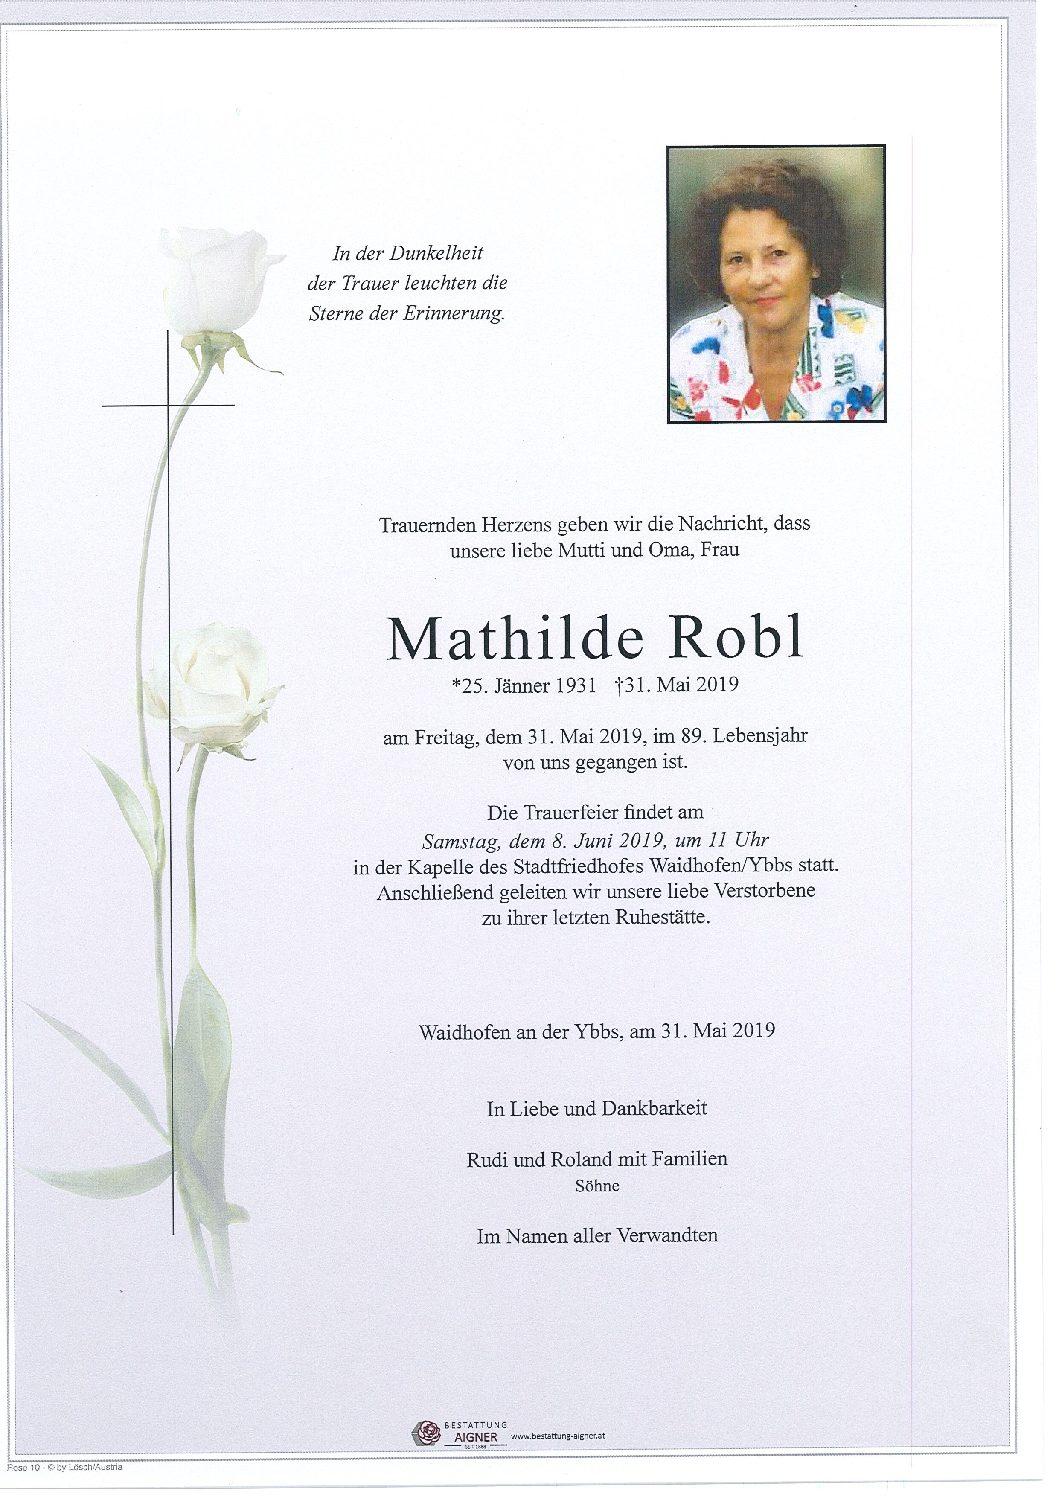 Mathilde Robl